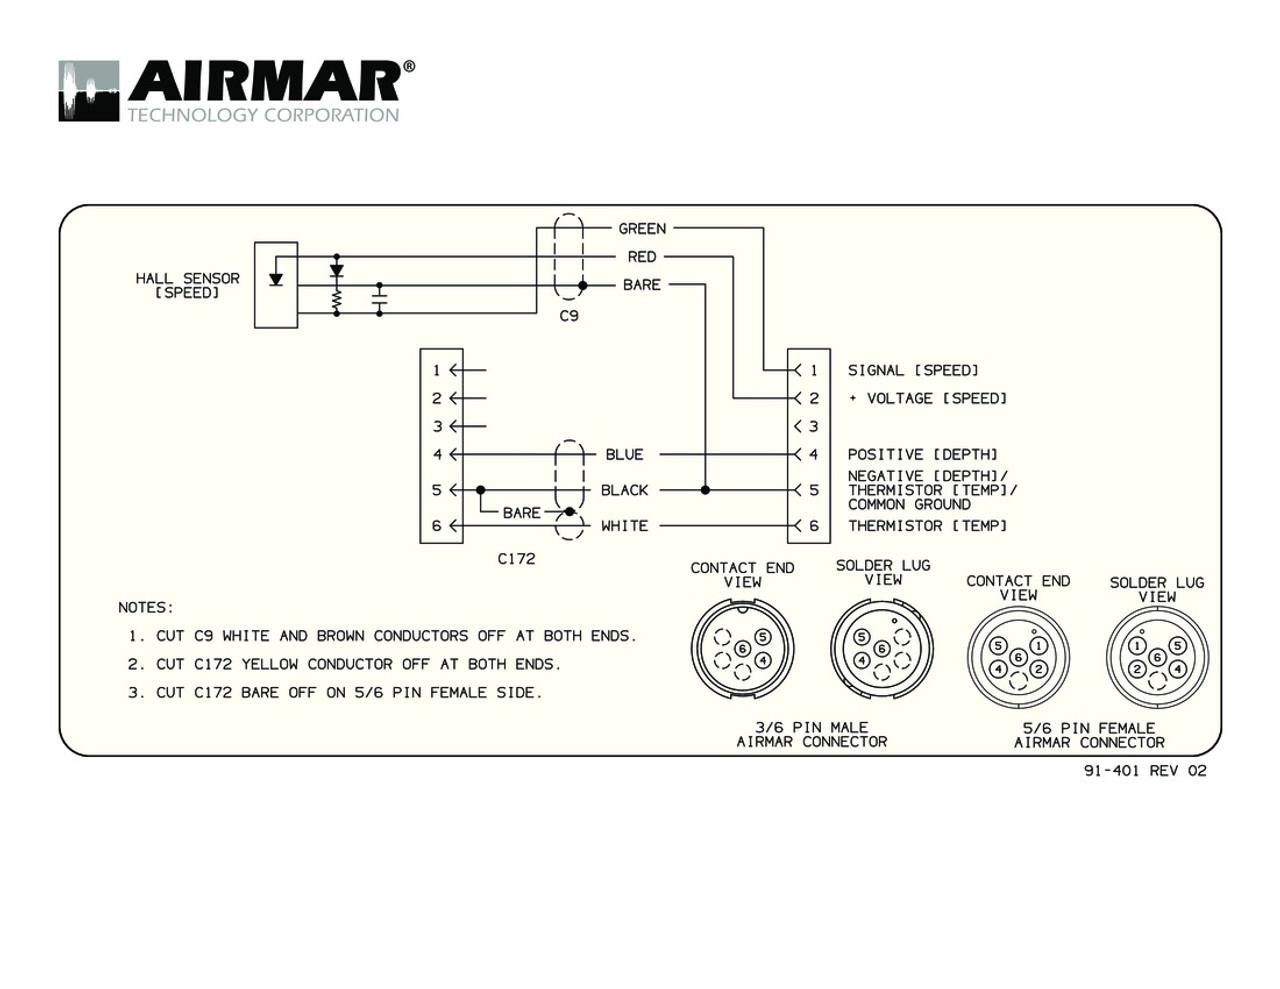 Airmar Wiring Diagram Garmin 6 pin (S) | Blue Bottle Marine